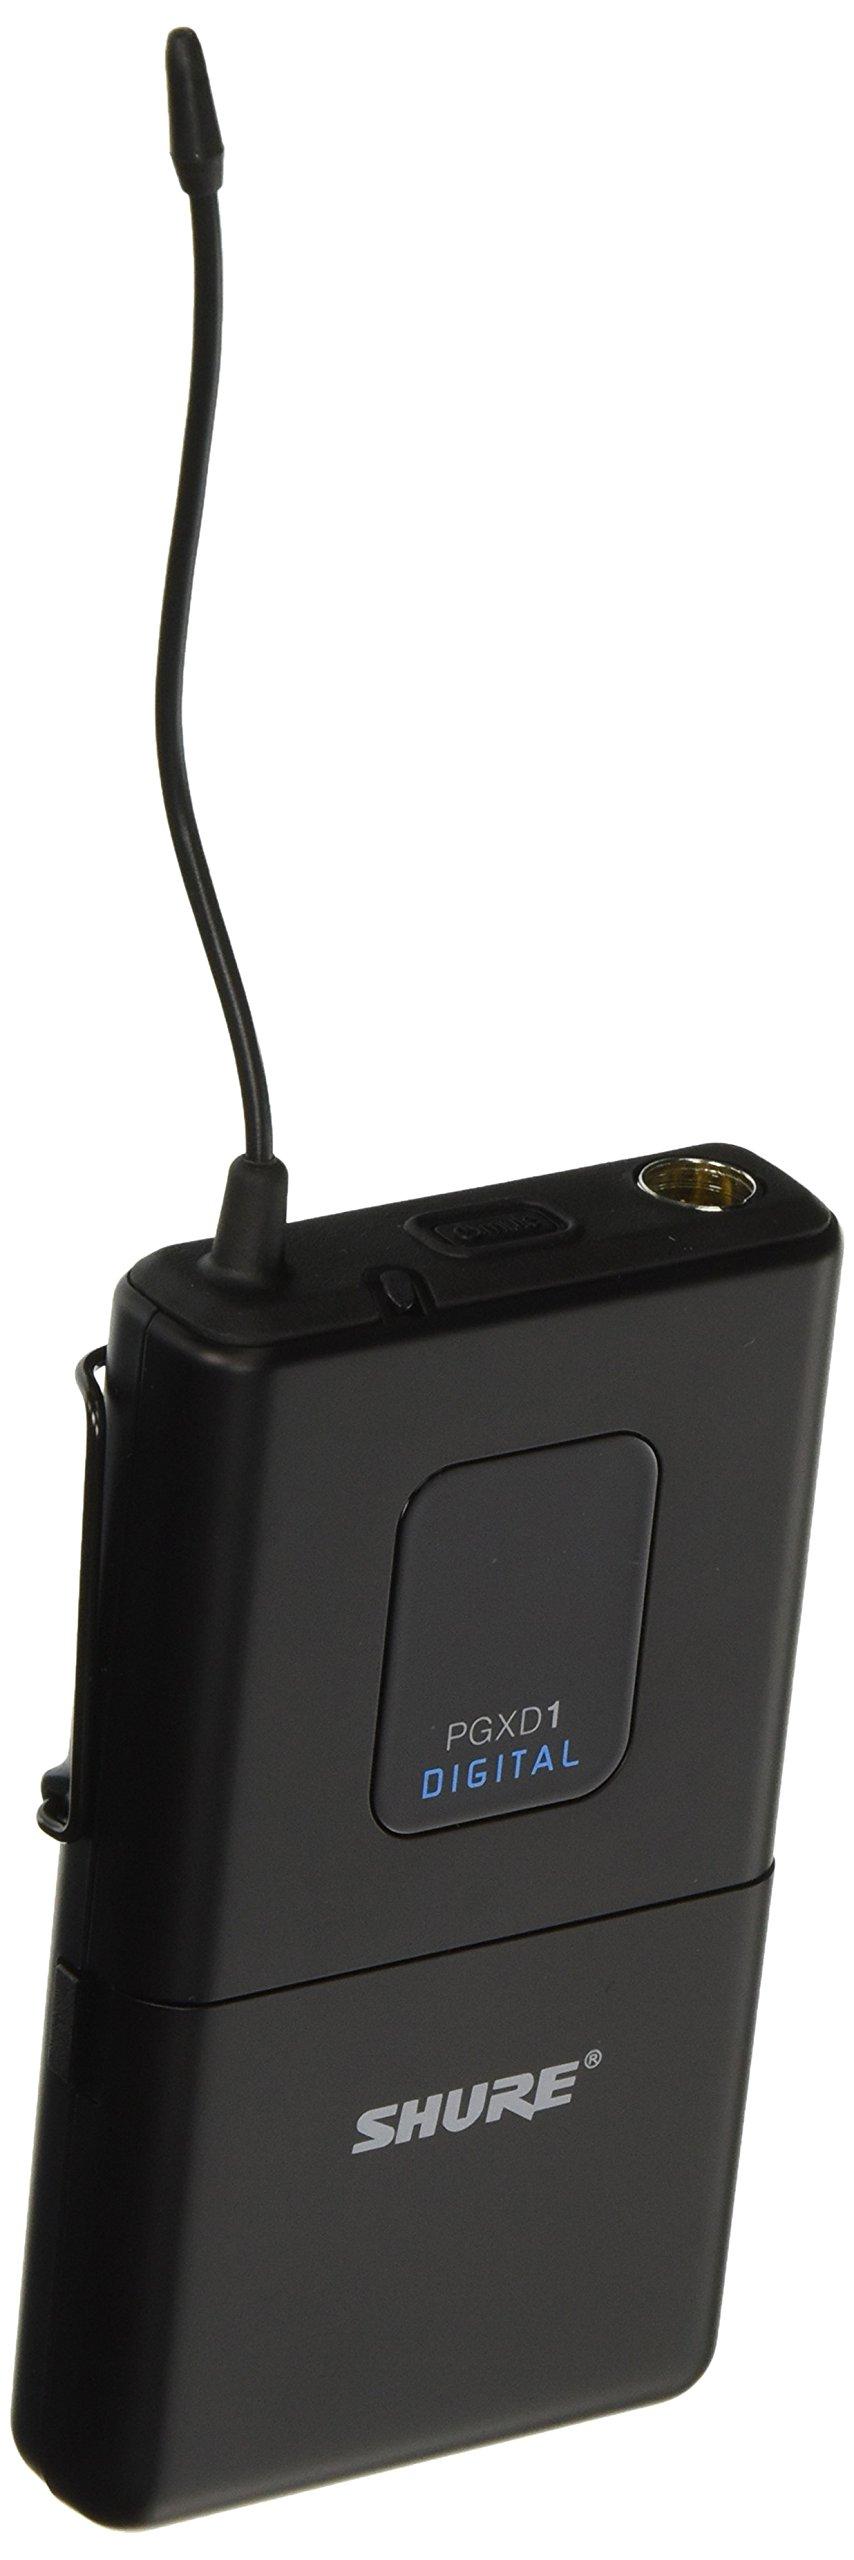 Shure PGXD1=-X8 Digital Wireless Bodypack Transmitter by Shure